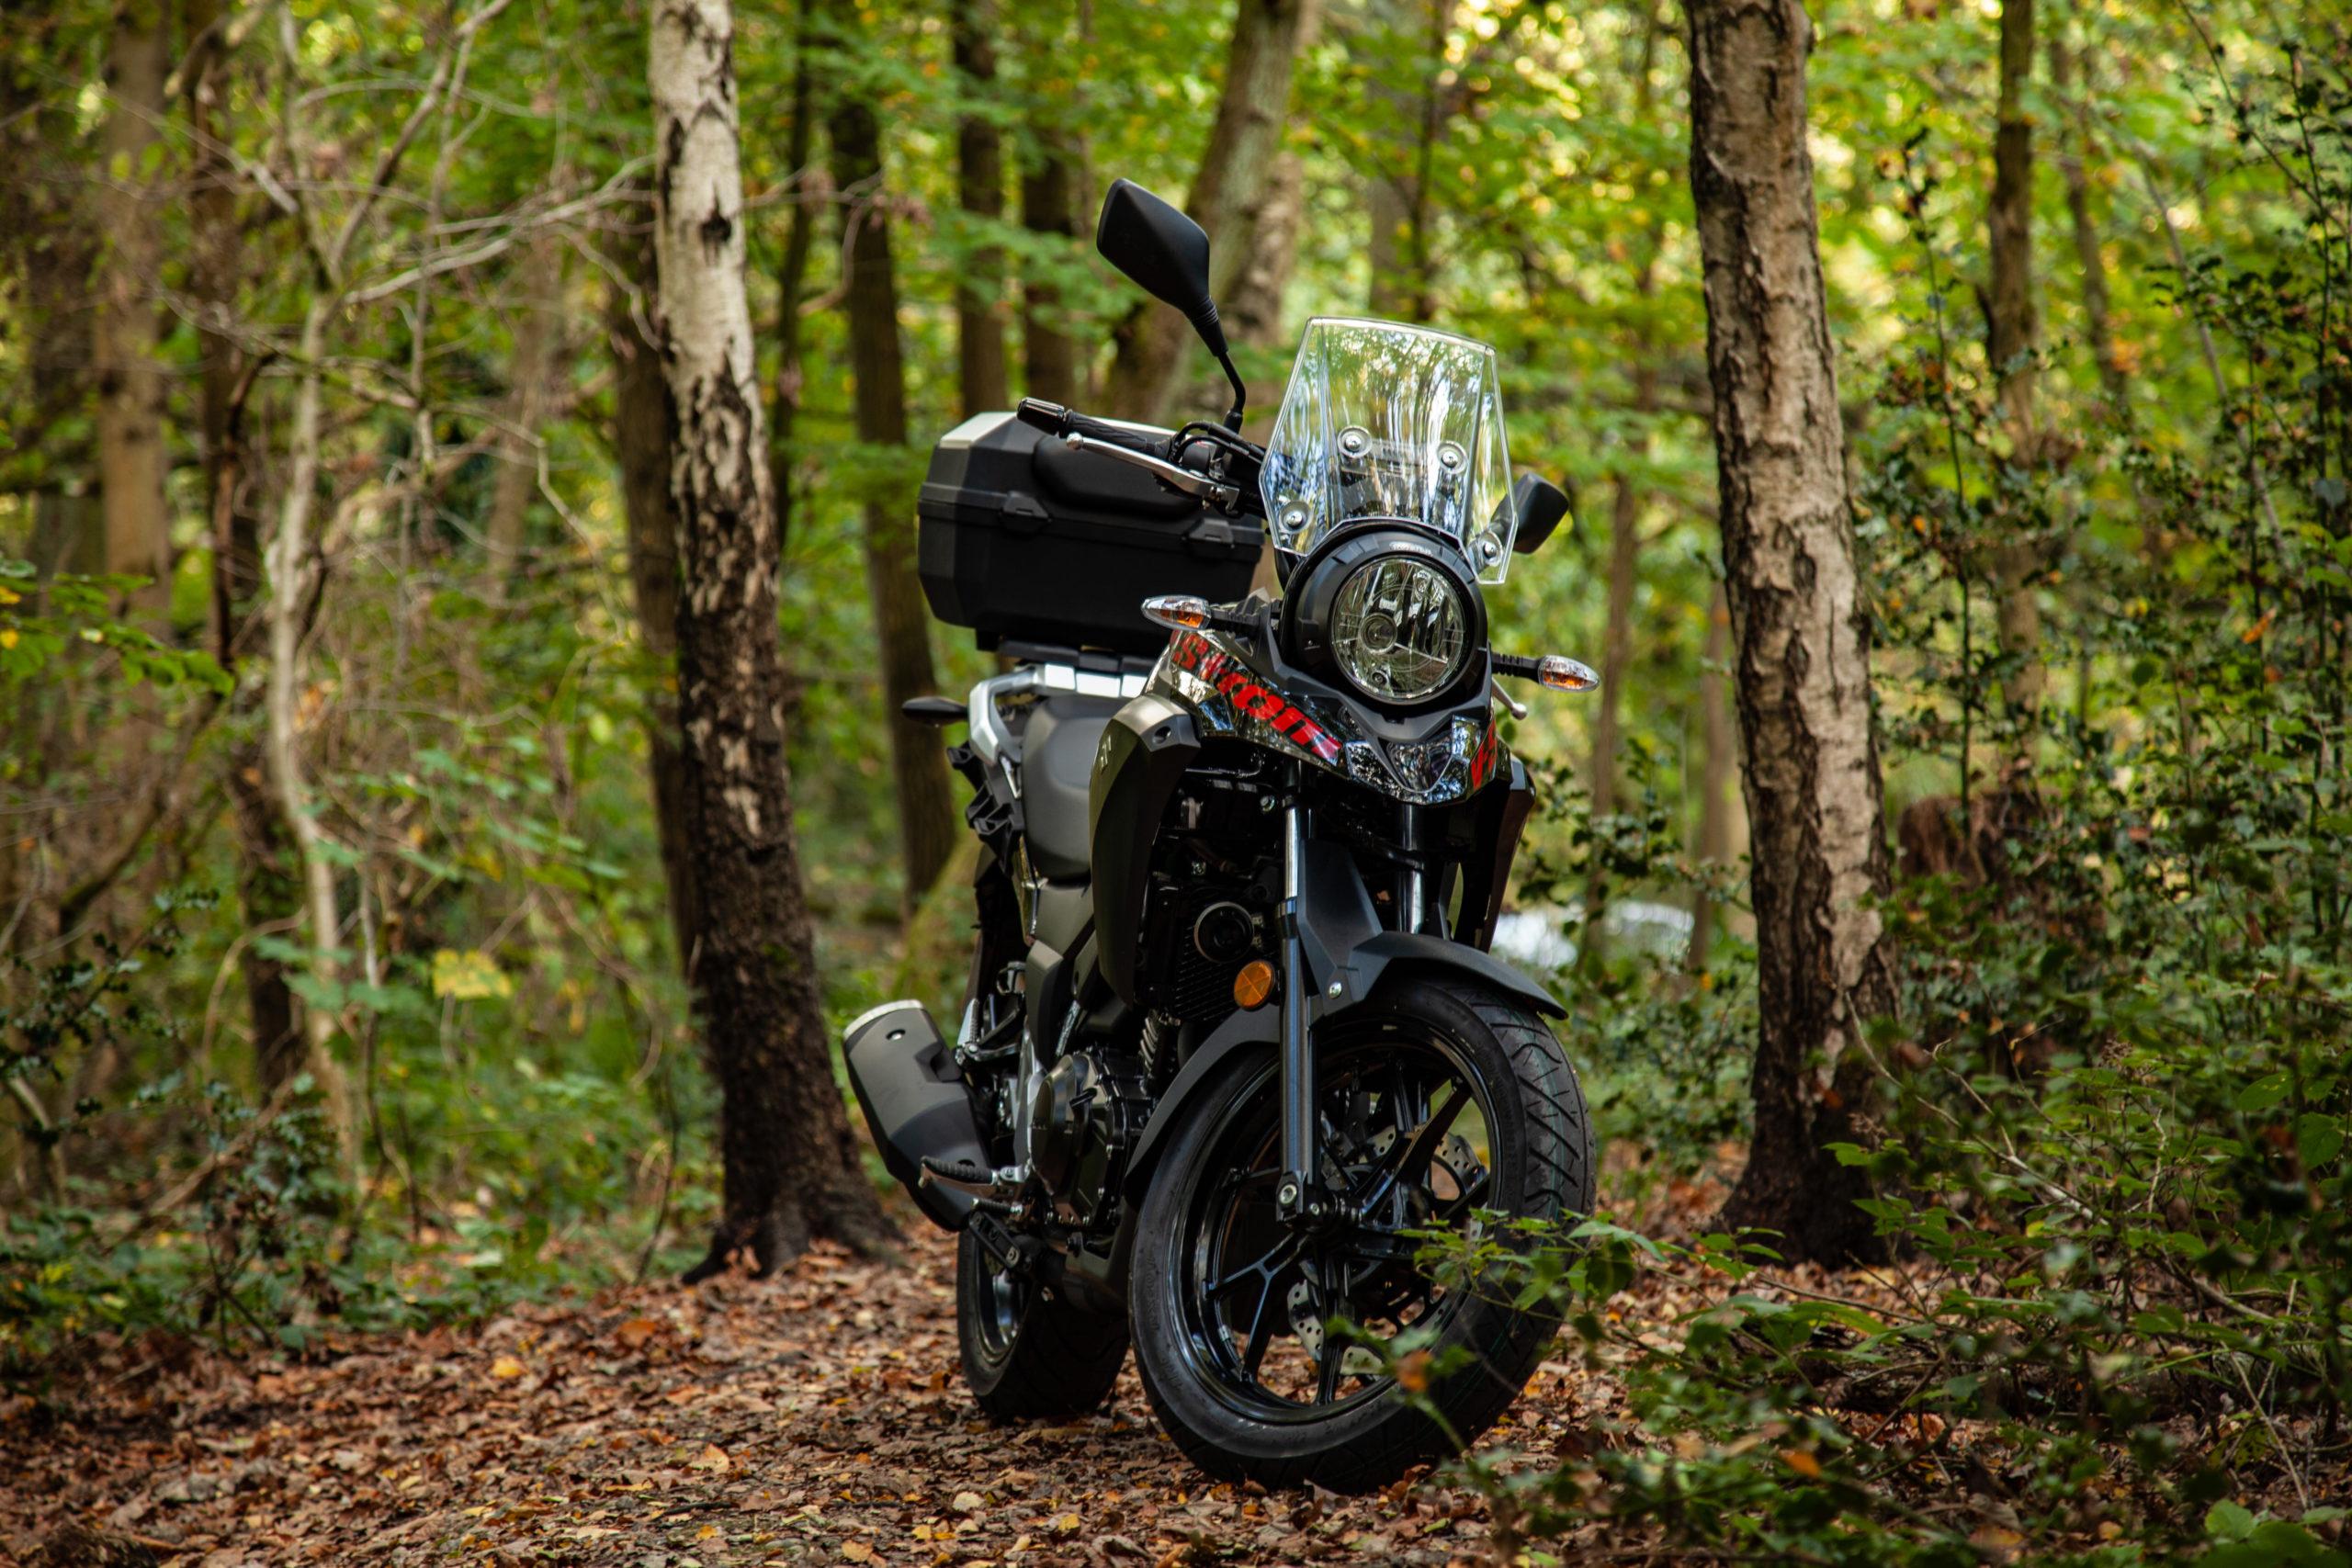 Suzuki dl250 off roading in the woods 1